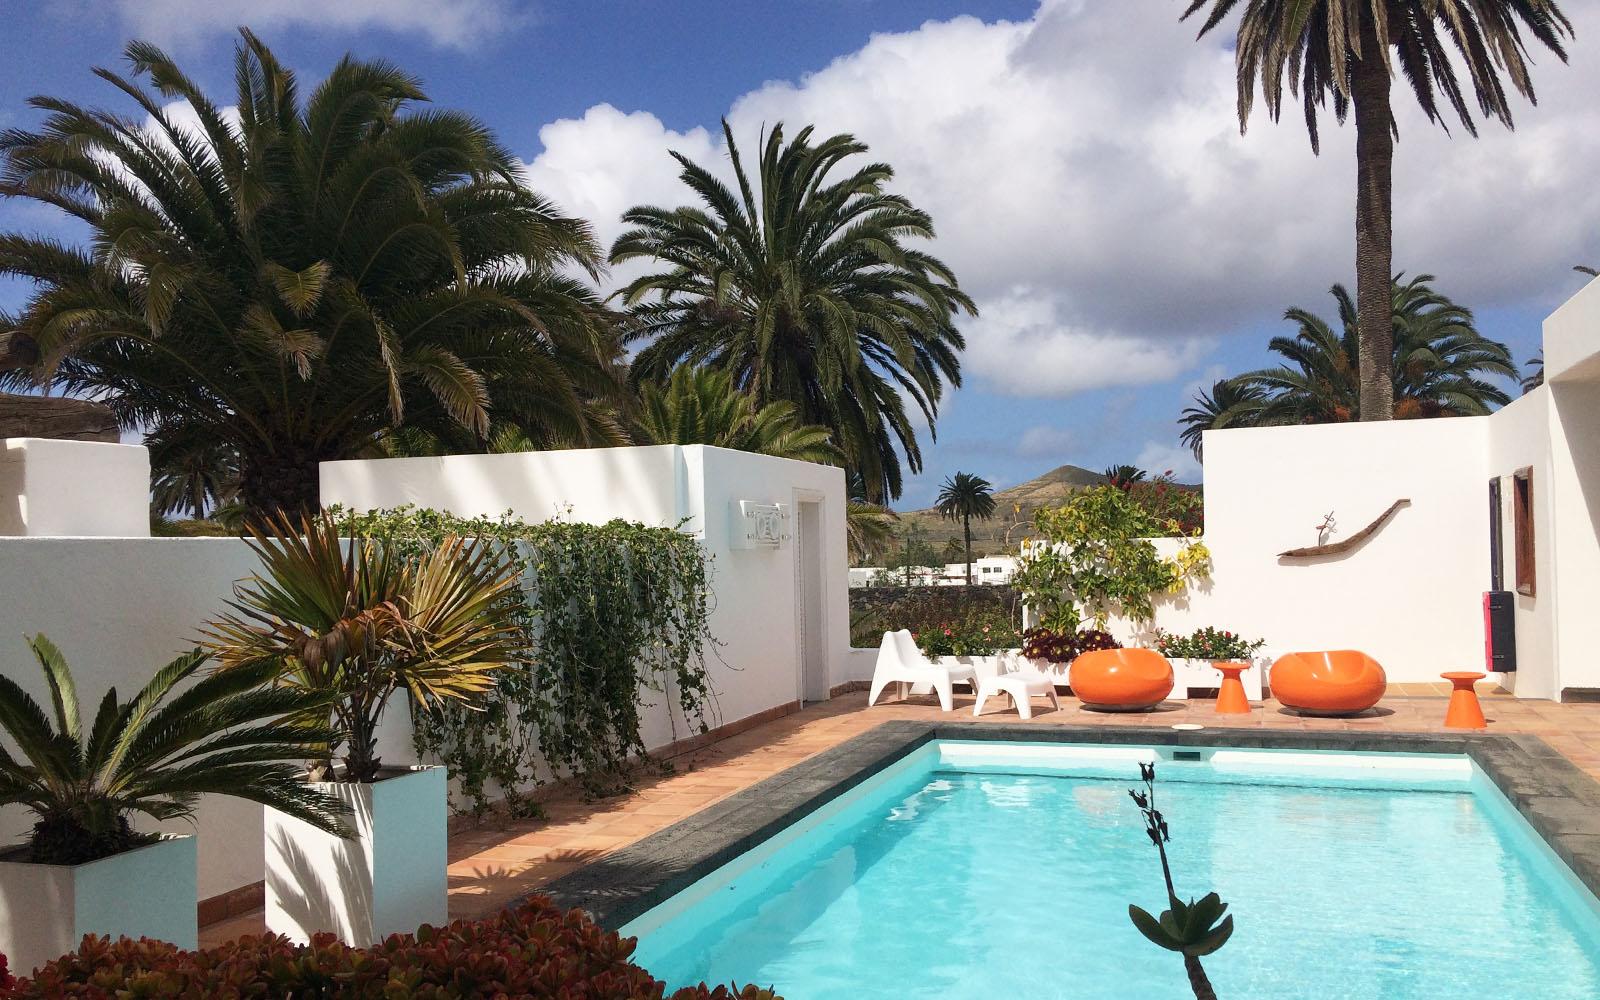 La piscina della casa di César Manrique ad Haria.